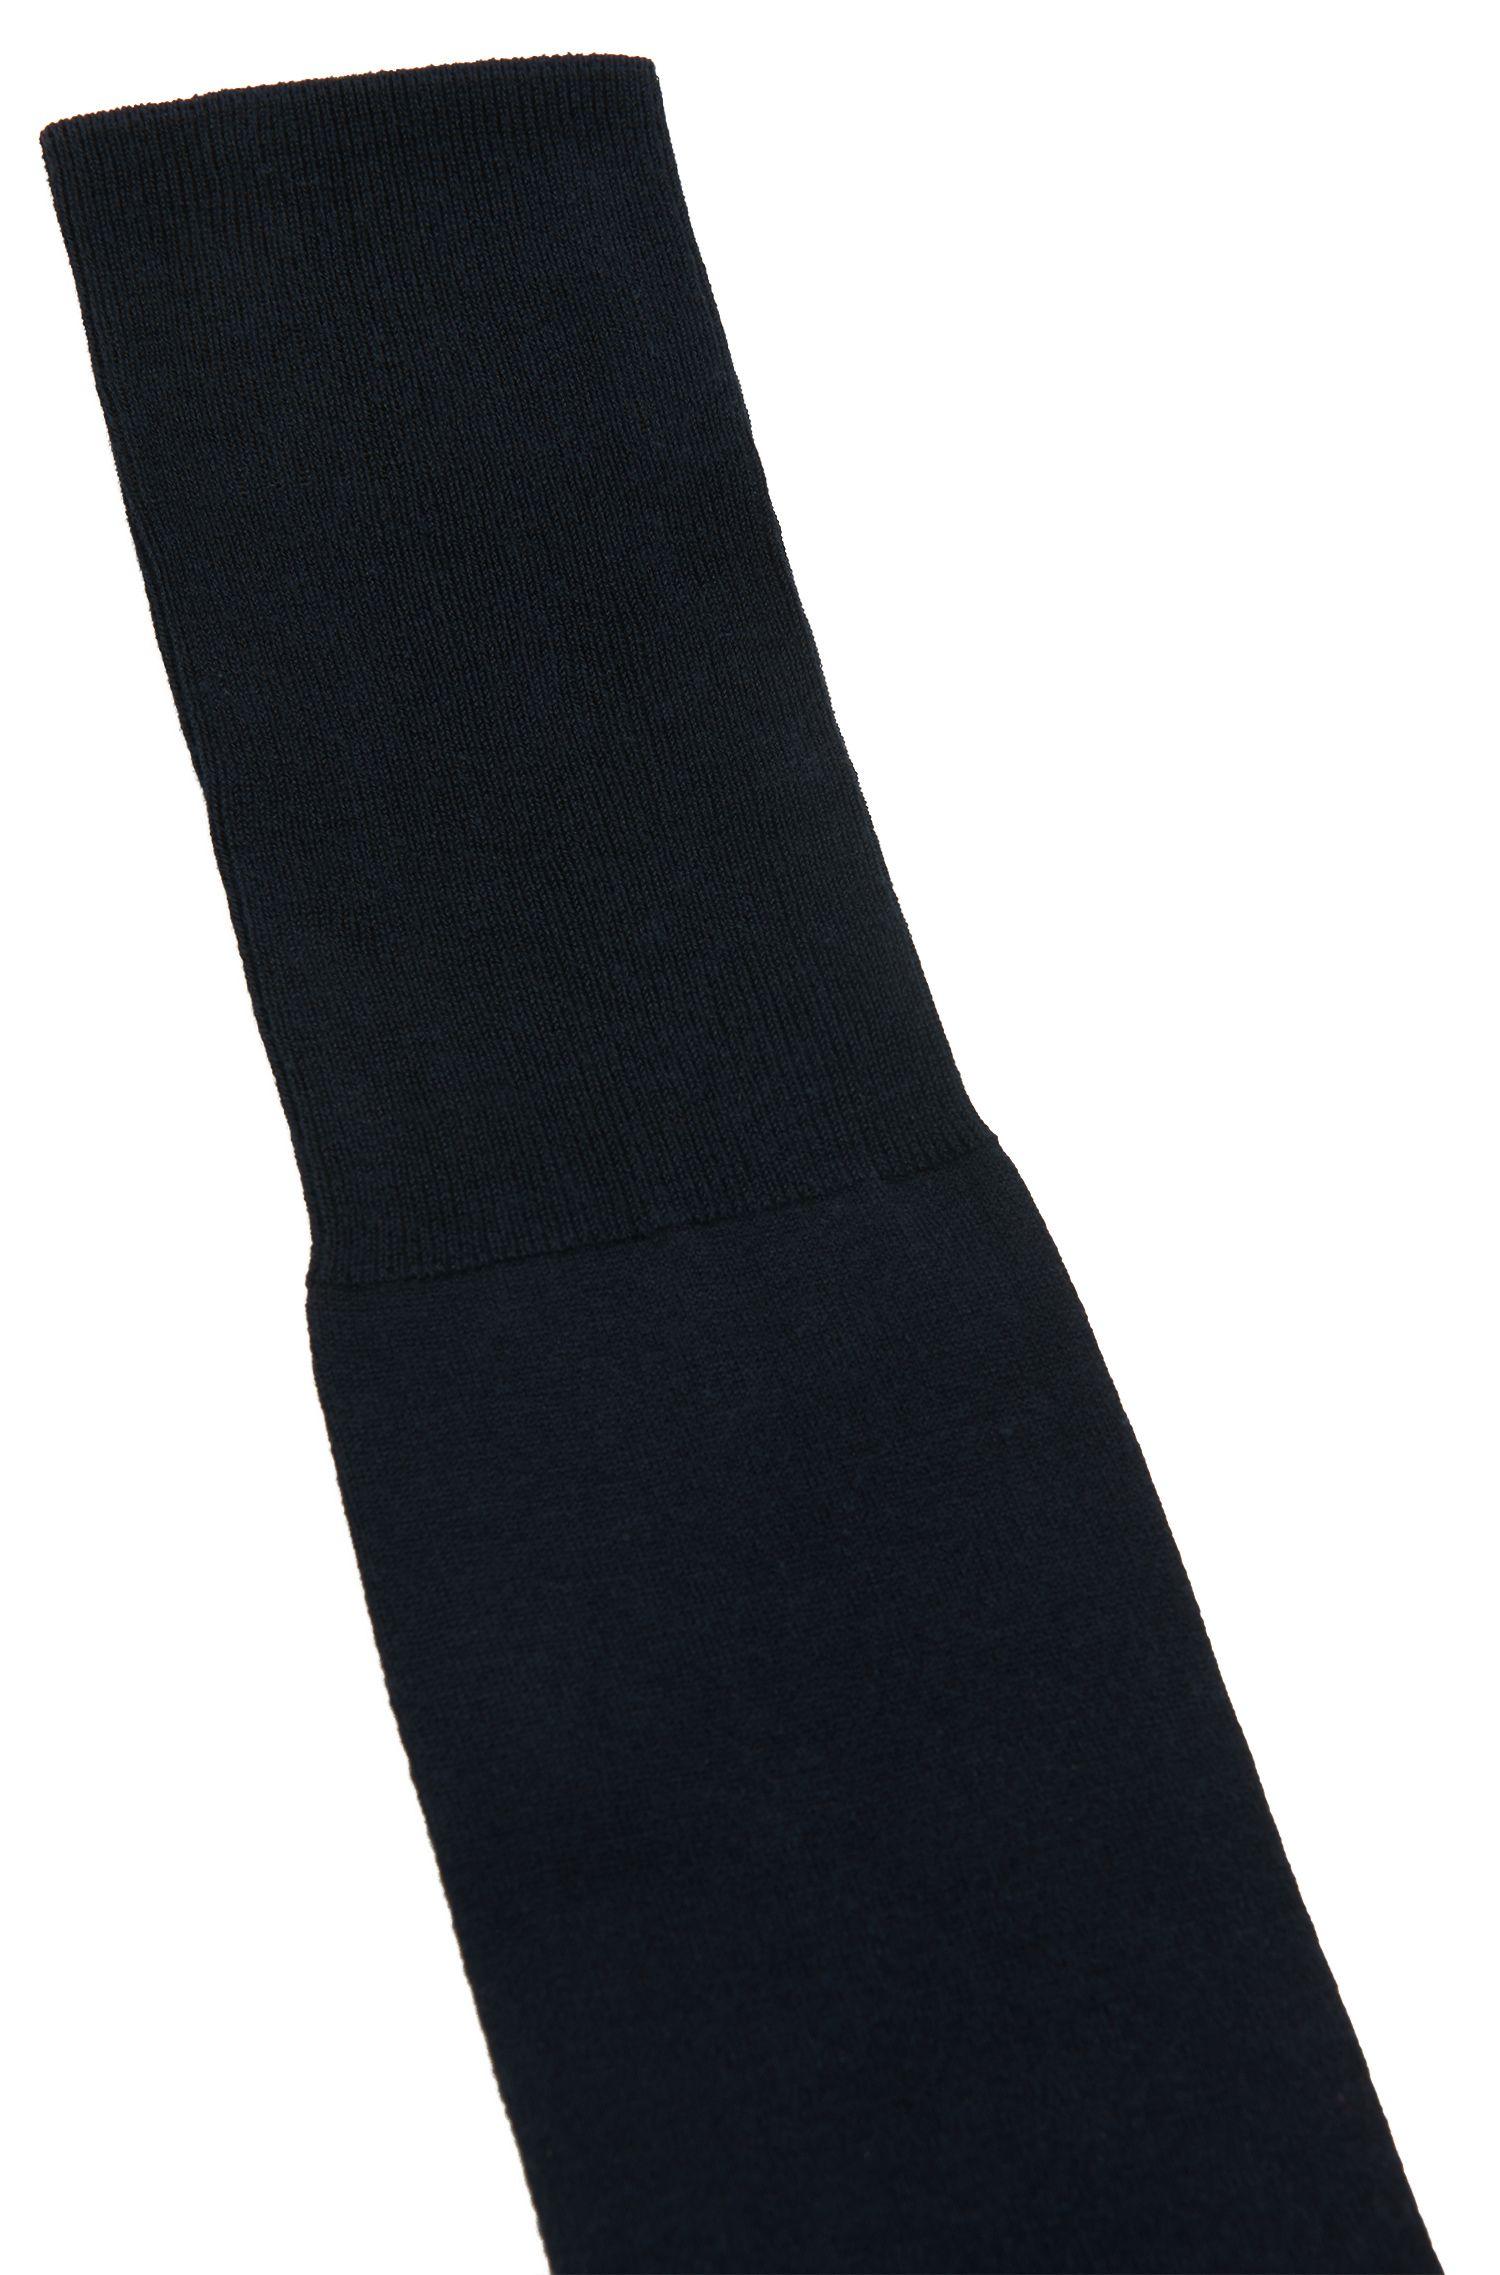 Mercerised-cotton knee-high socks with reinforced heel , Dark Blue